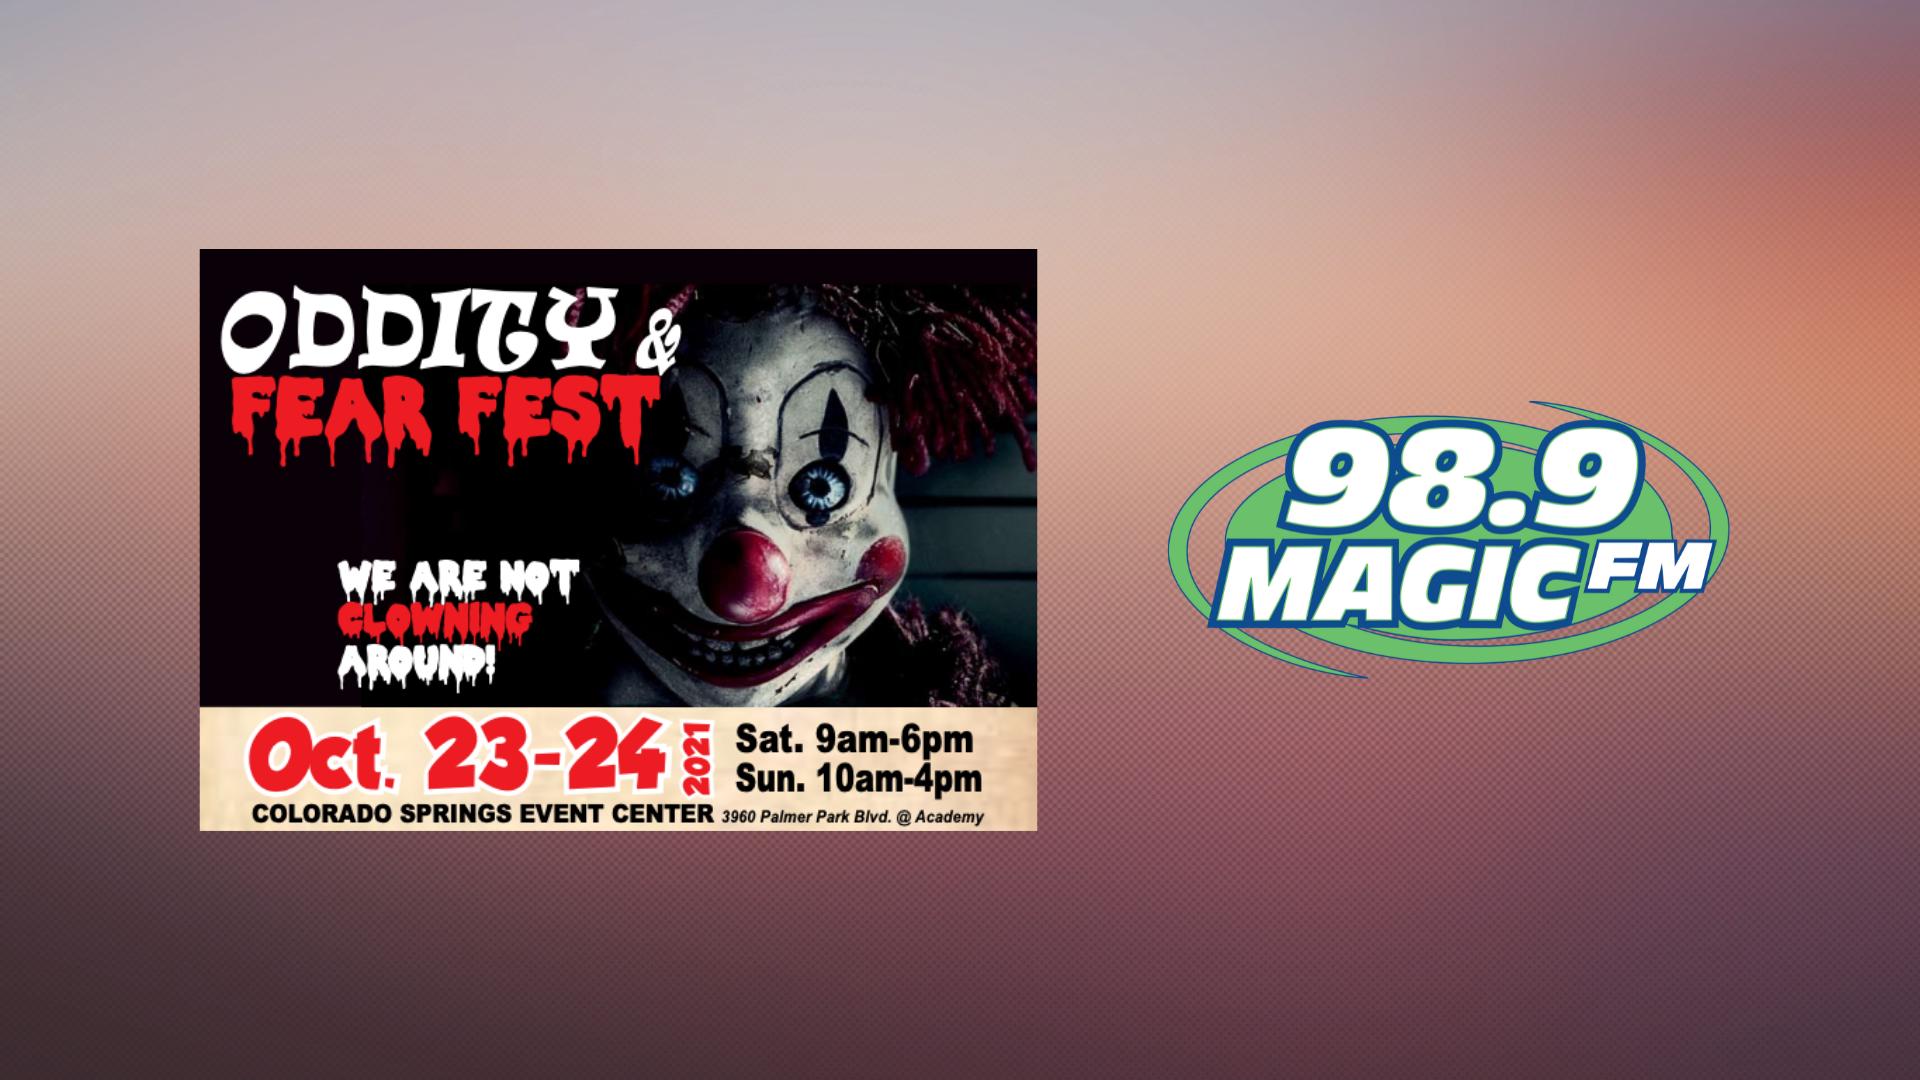 Win Oddity and Fear Fest Tix